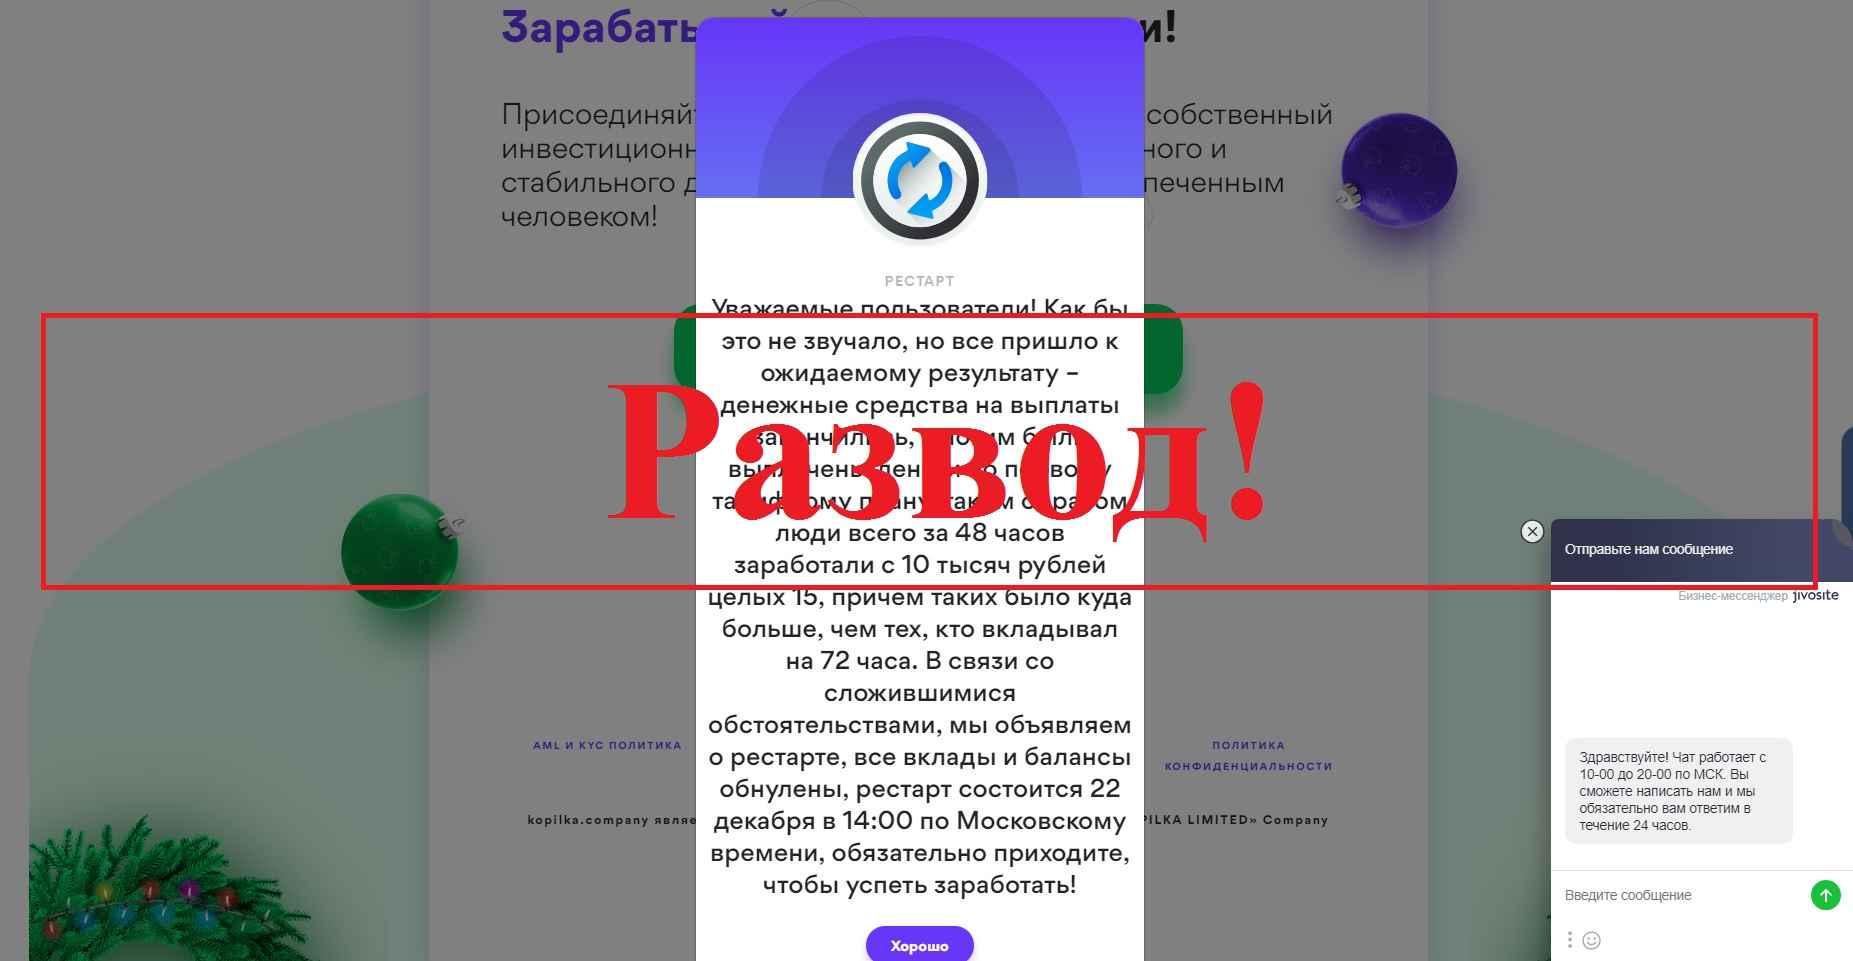 KOPILKA LIMITED – отзывы об инвестиционном проекте kopilka.company